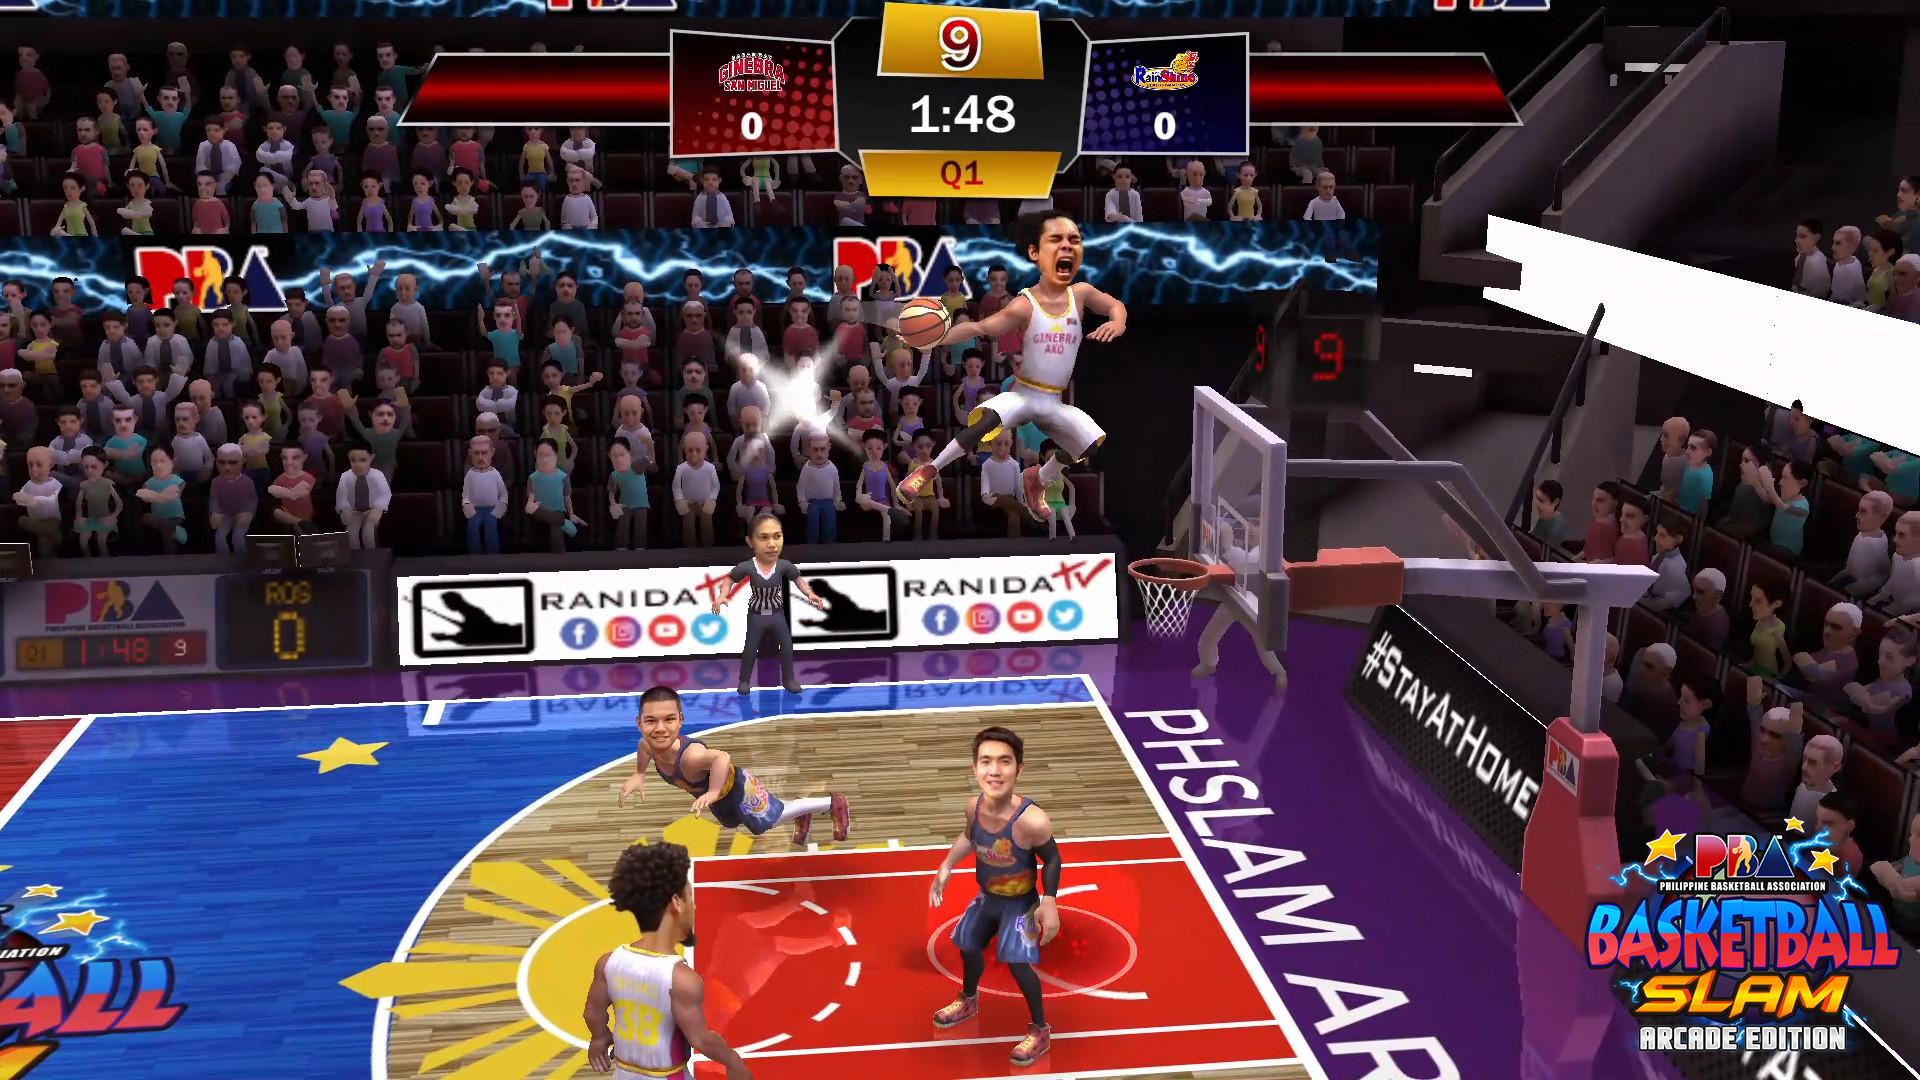 pba-basketball